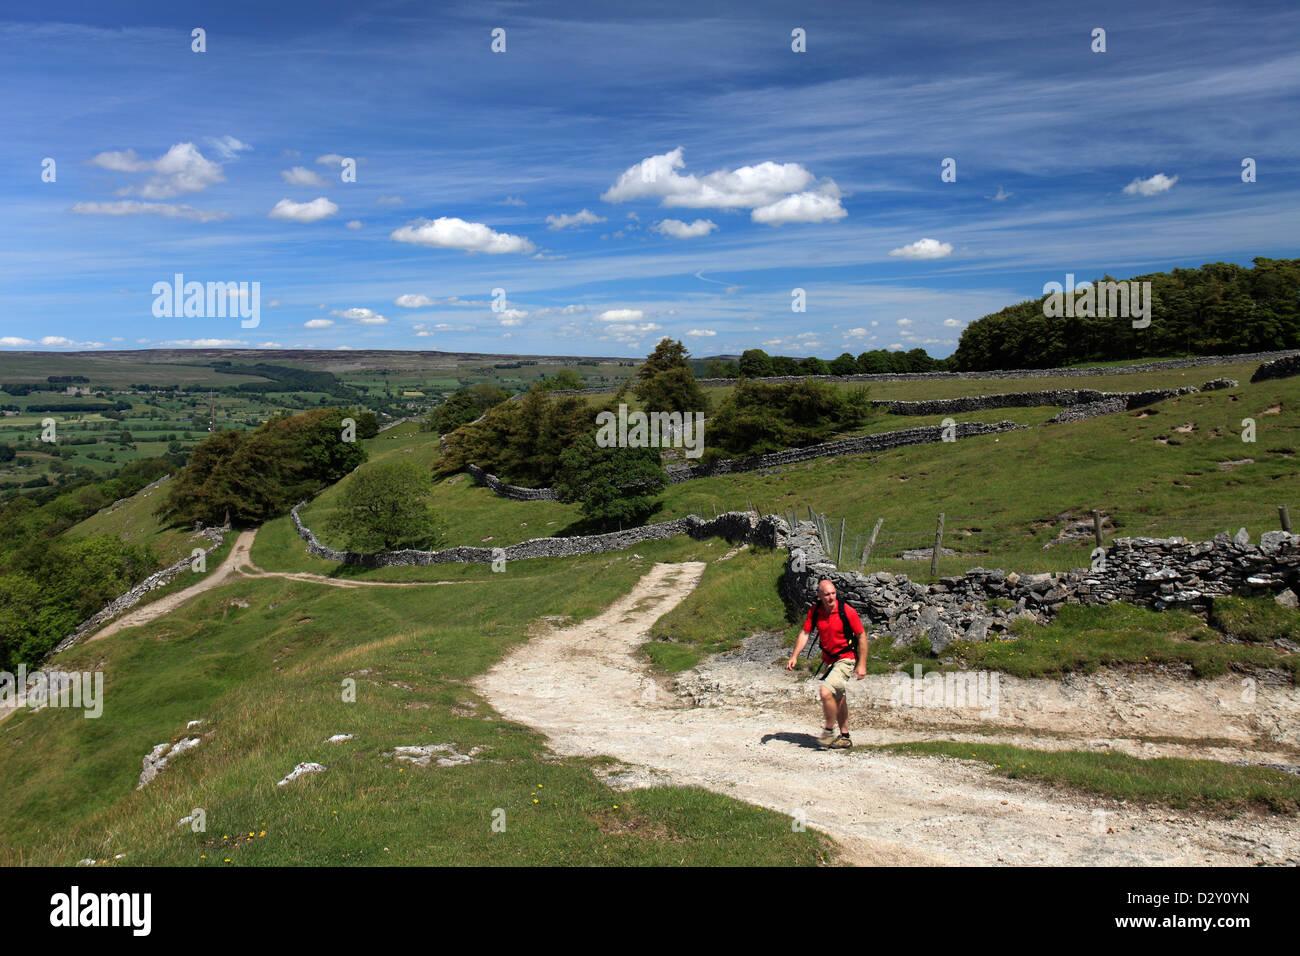 Adult male walker near West Burton village, Wensleydale, Yorkshire Dales National Park, England, United Kingdom - Stock Image